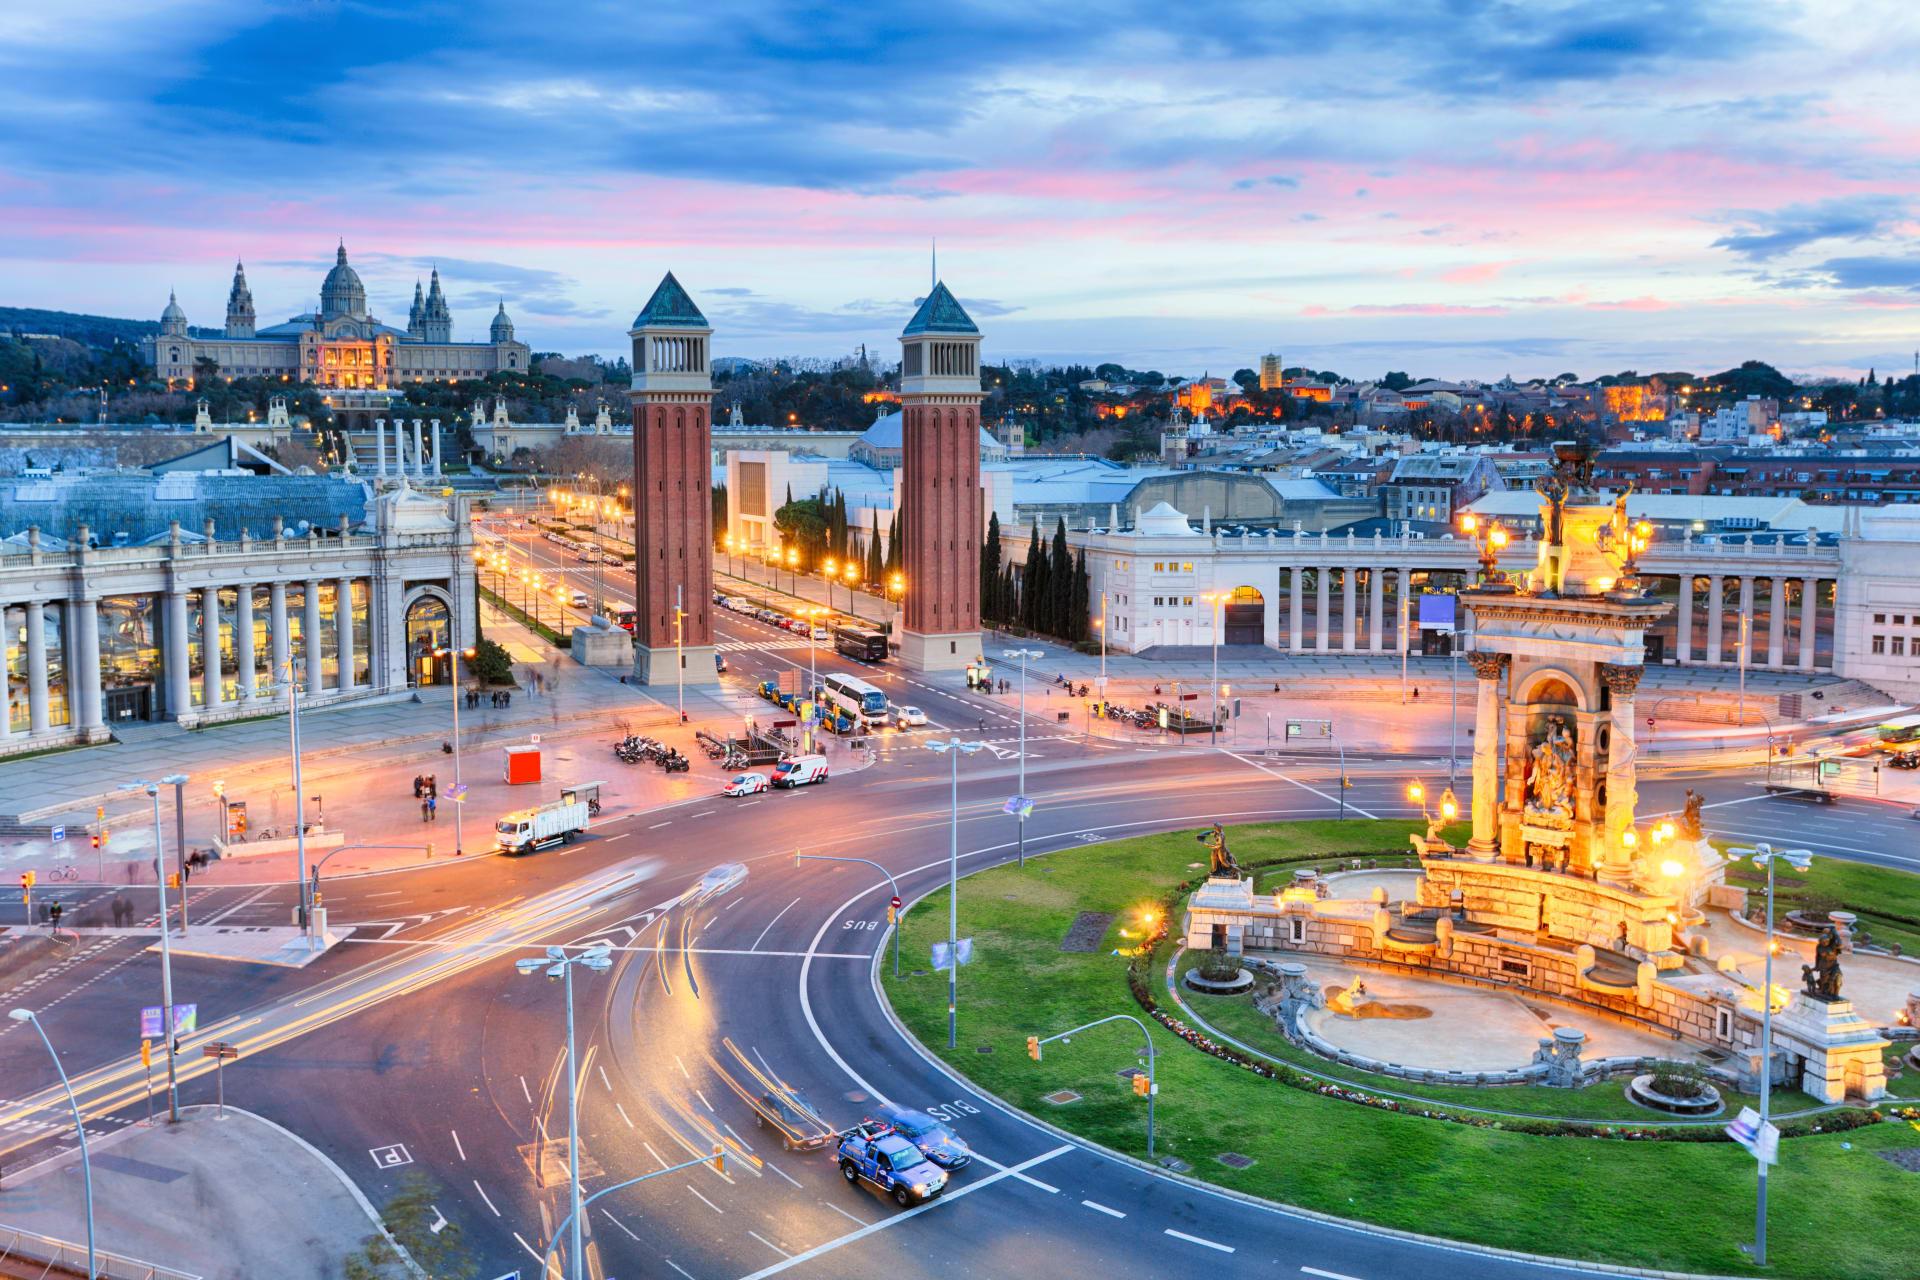 Barcelona - A Car Ride Showcasing Impressive Views of Barcelona